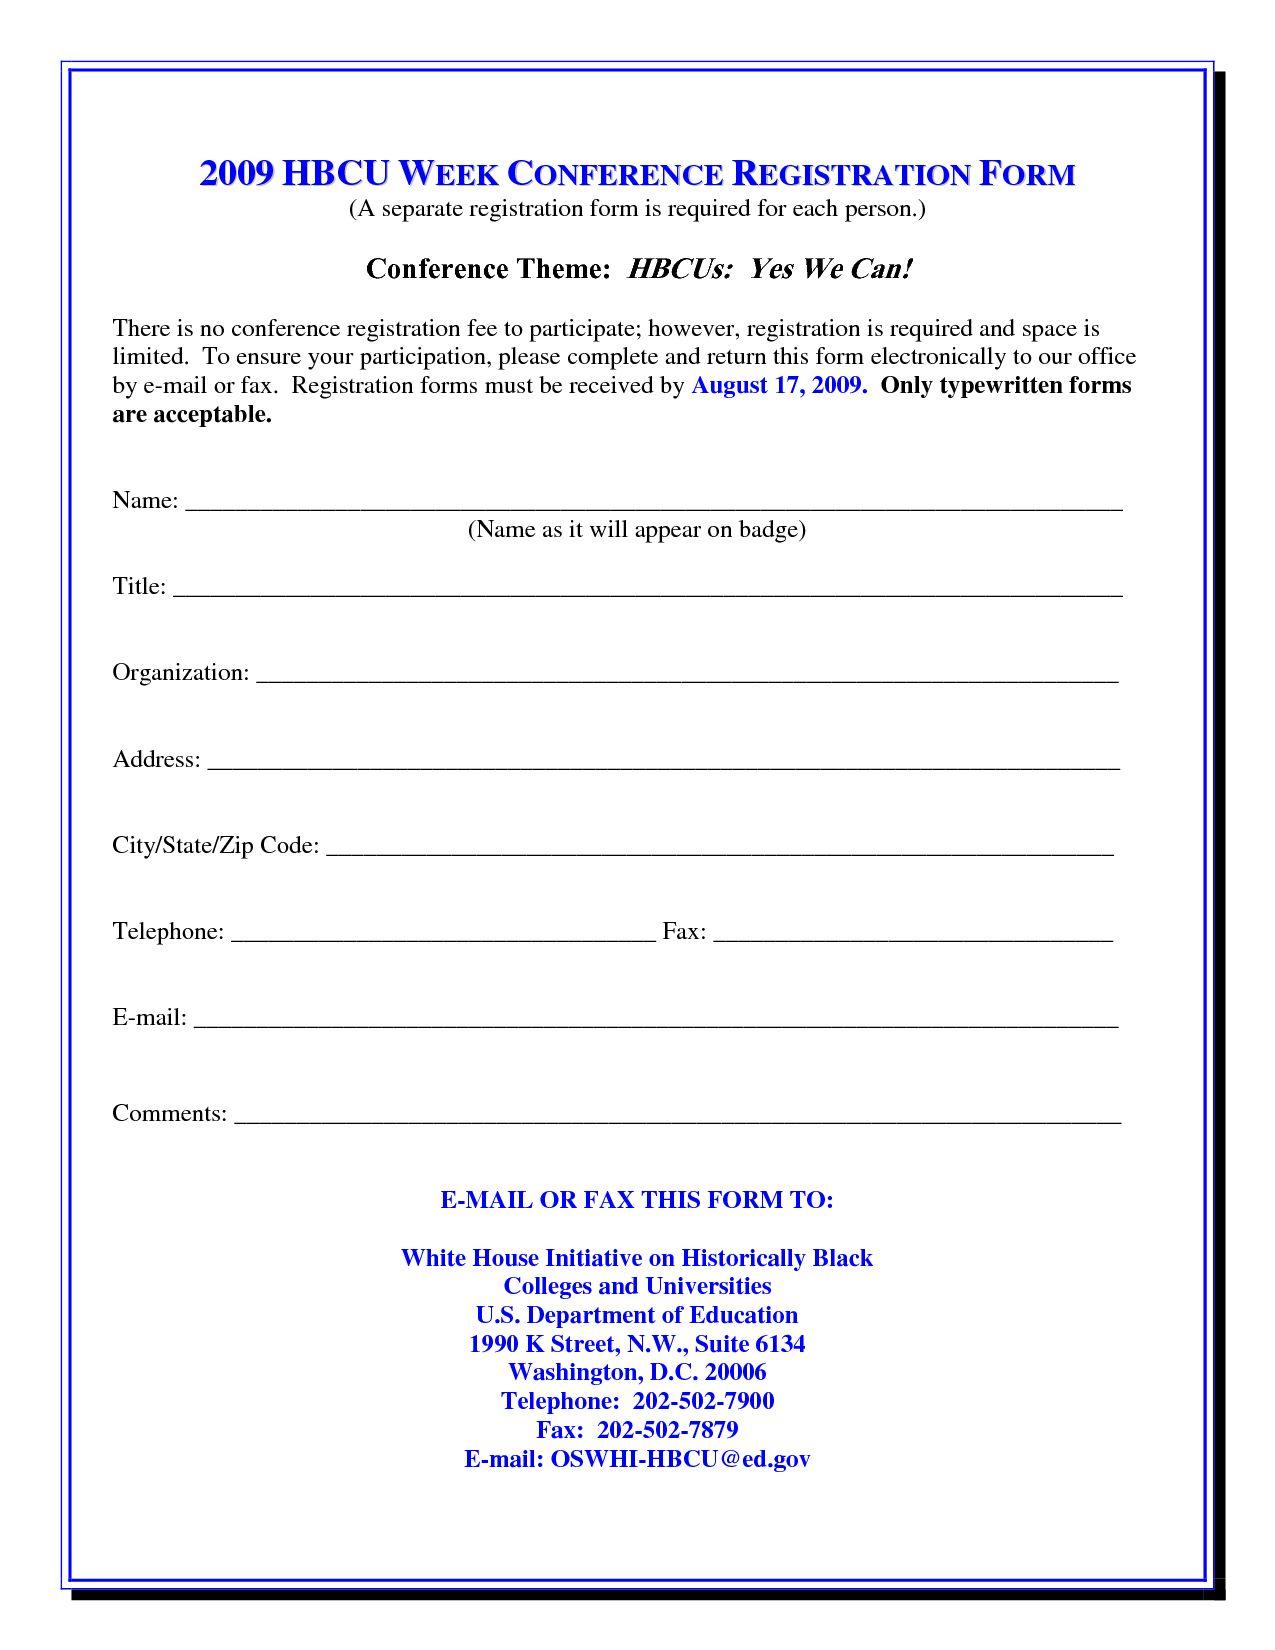 017 Template Ideas Class Registration Form Word 317167 Forms For Seminar Registration Form Template Word Best Sampl Registration Form Word Template Word Form